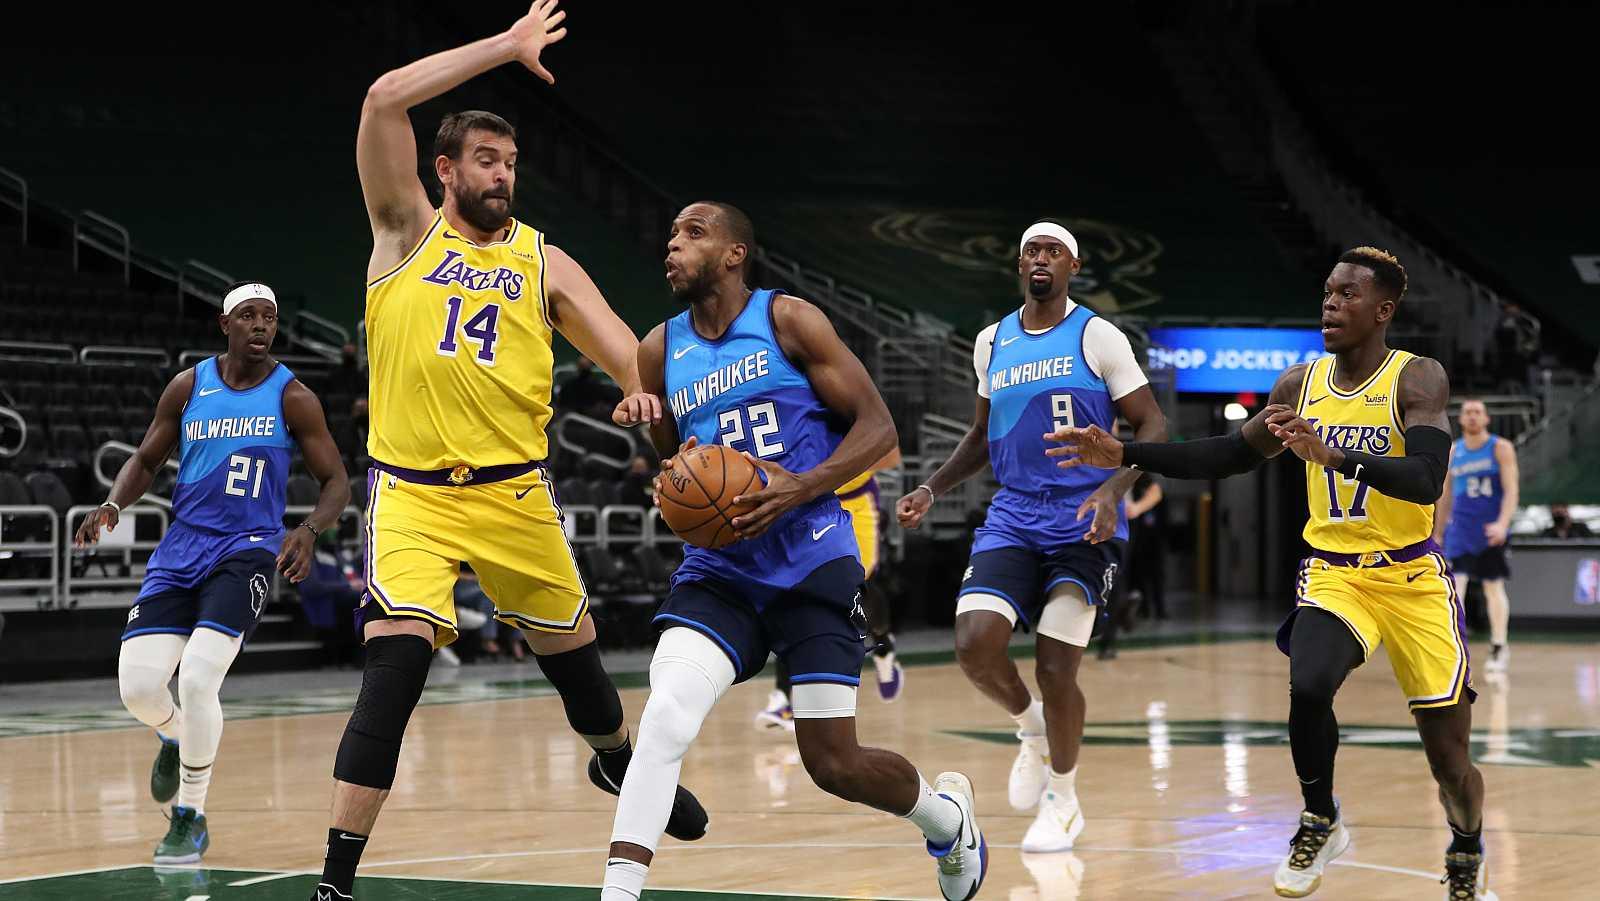 Los Lakers tumban a los Bucks de Antetokounmpo